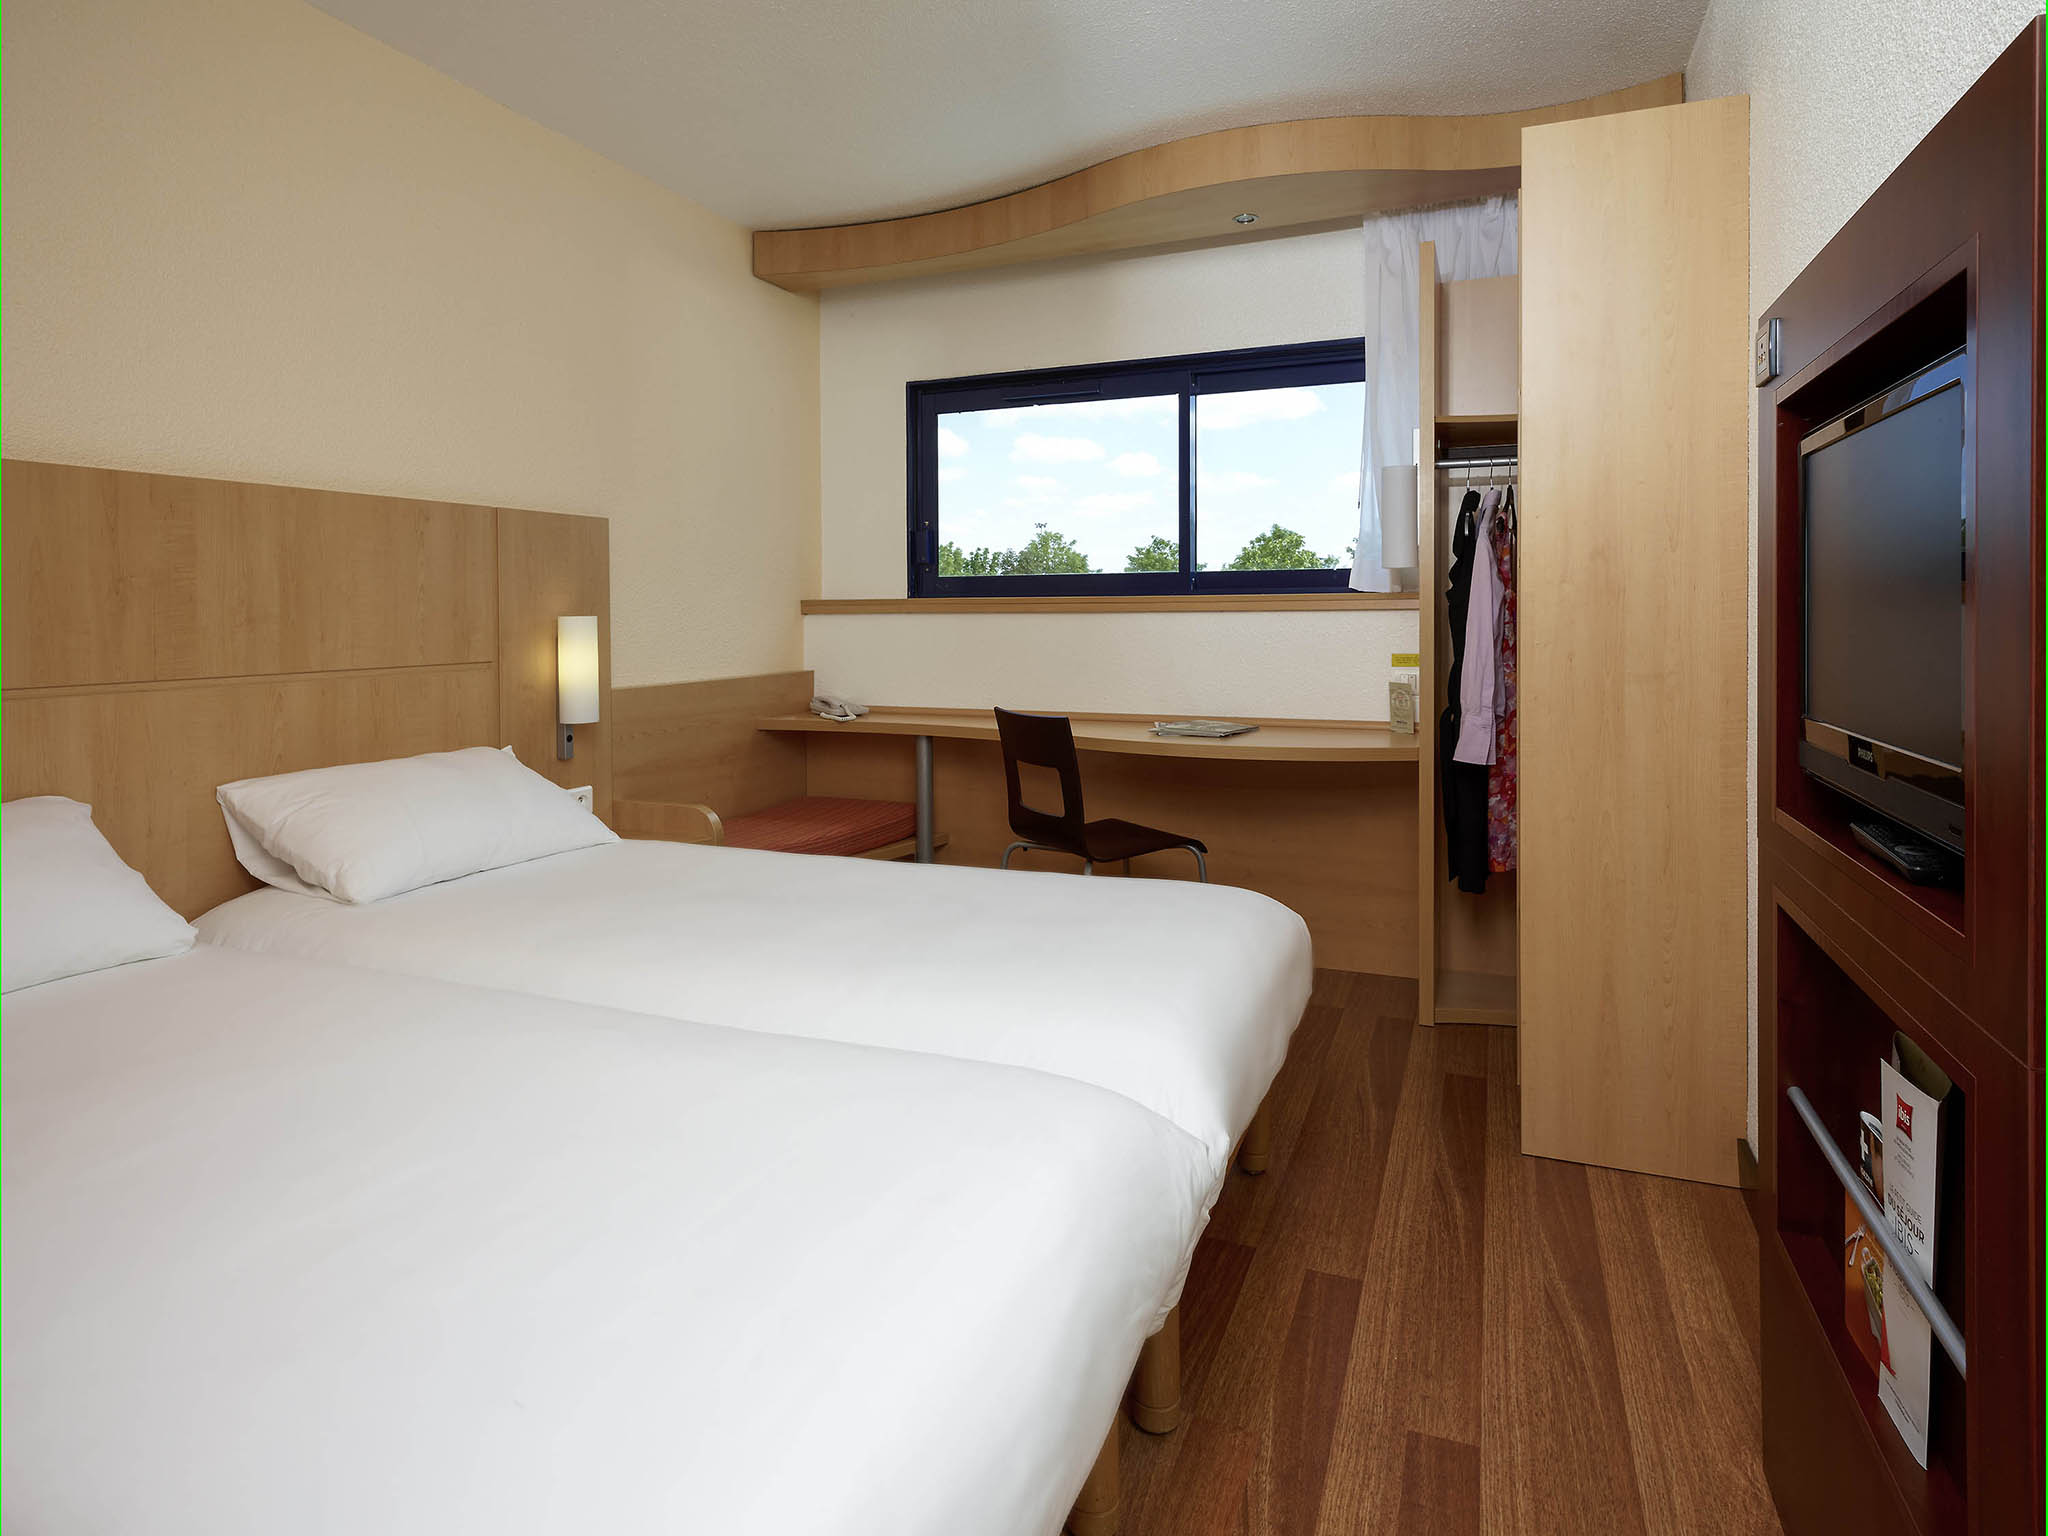 Hotel In CHASSENEUIL DU POITOU Ibis Site Du Futuroscope - Chambre d hote chasseneuil du poitou